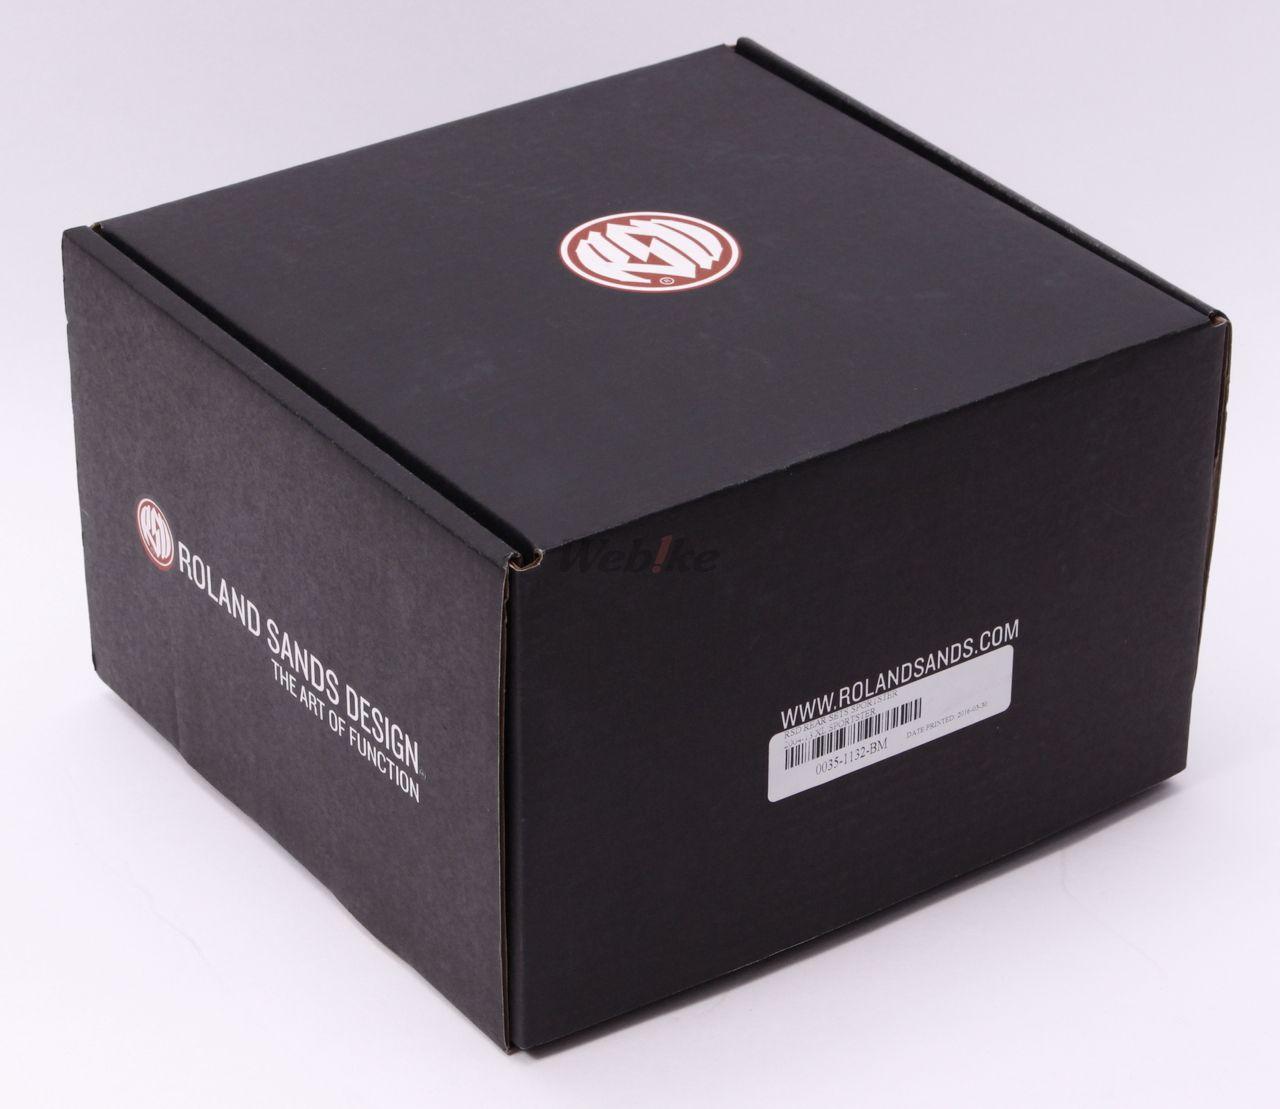 【RSD Roland Sands Design】腳踏後移套件 (REARSETS/對比色) - 「Webike-摩托百貨」